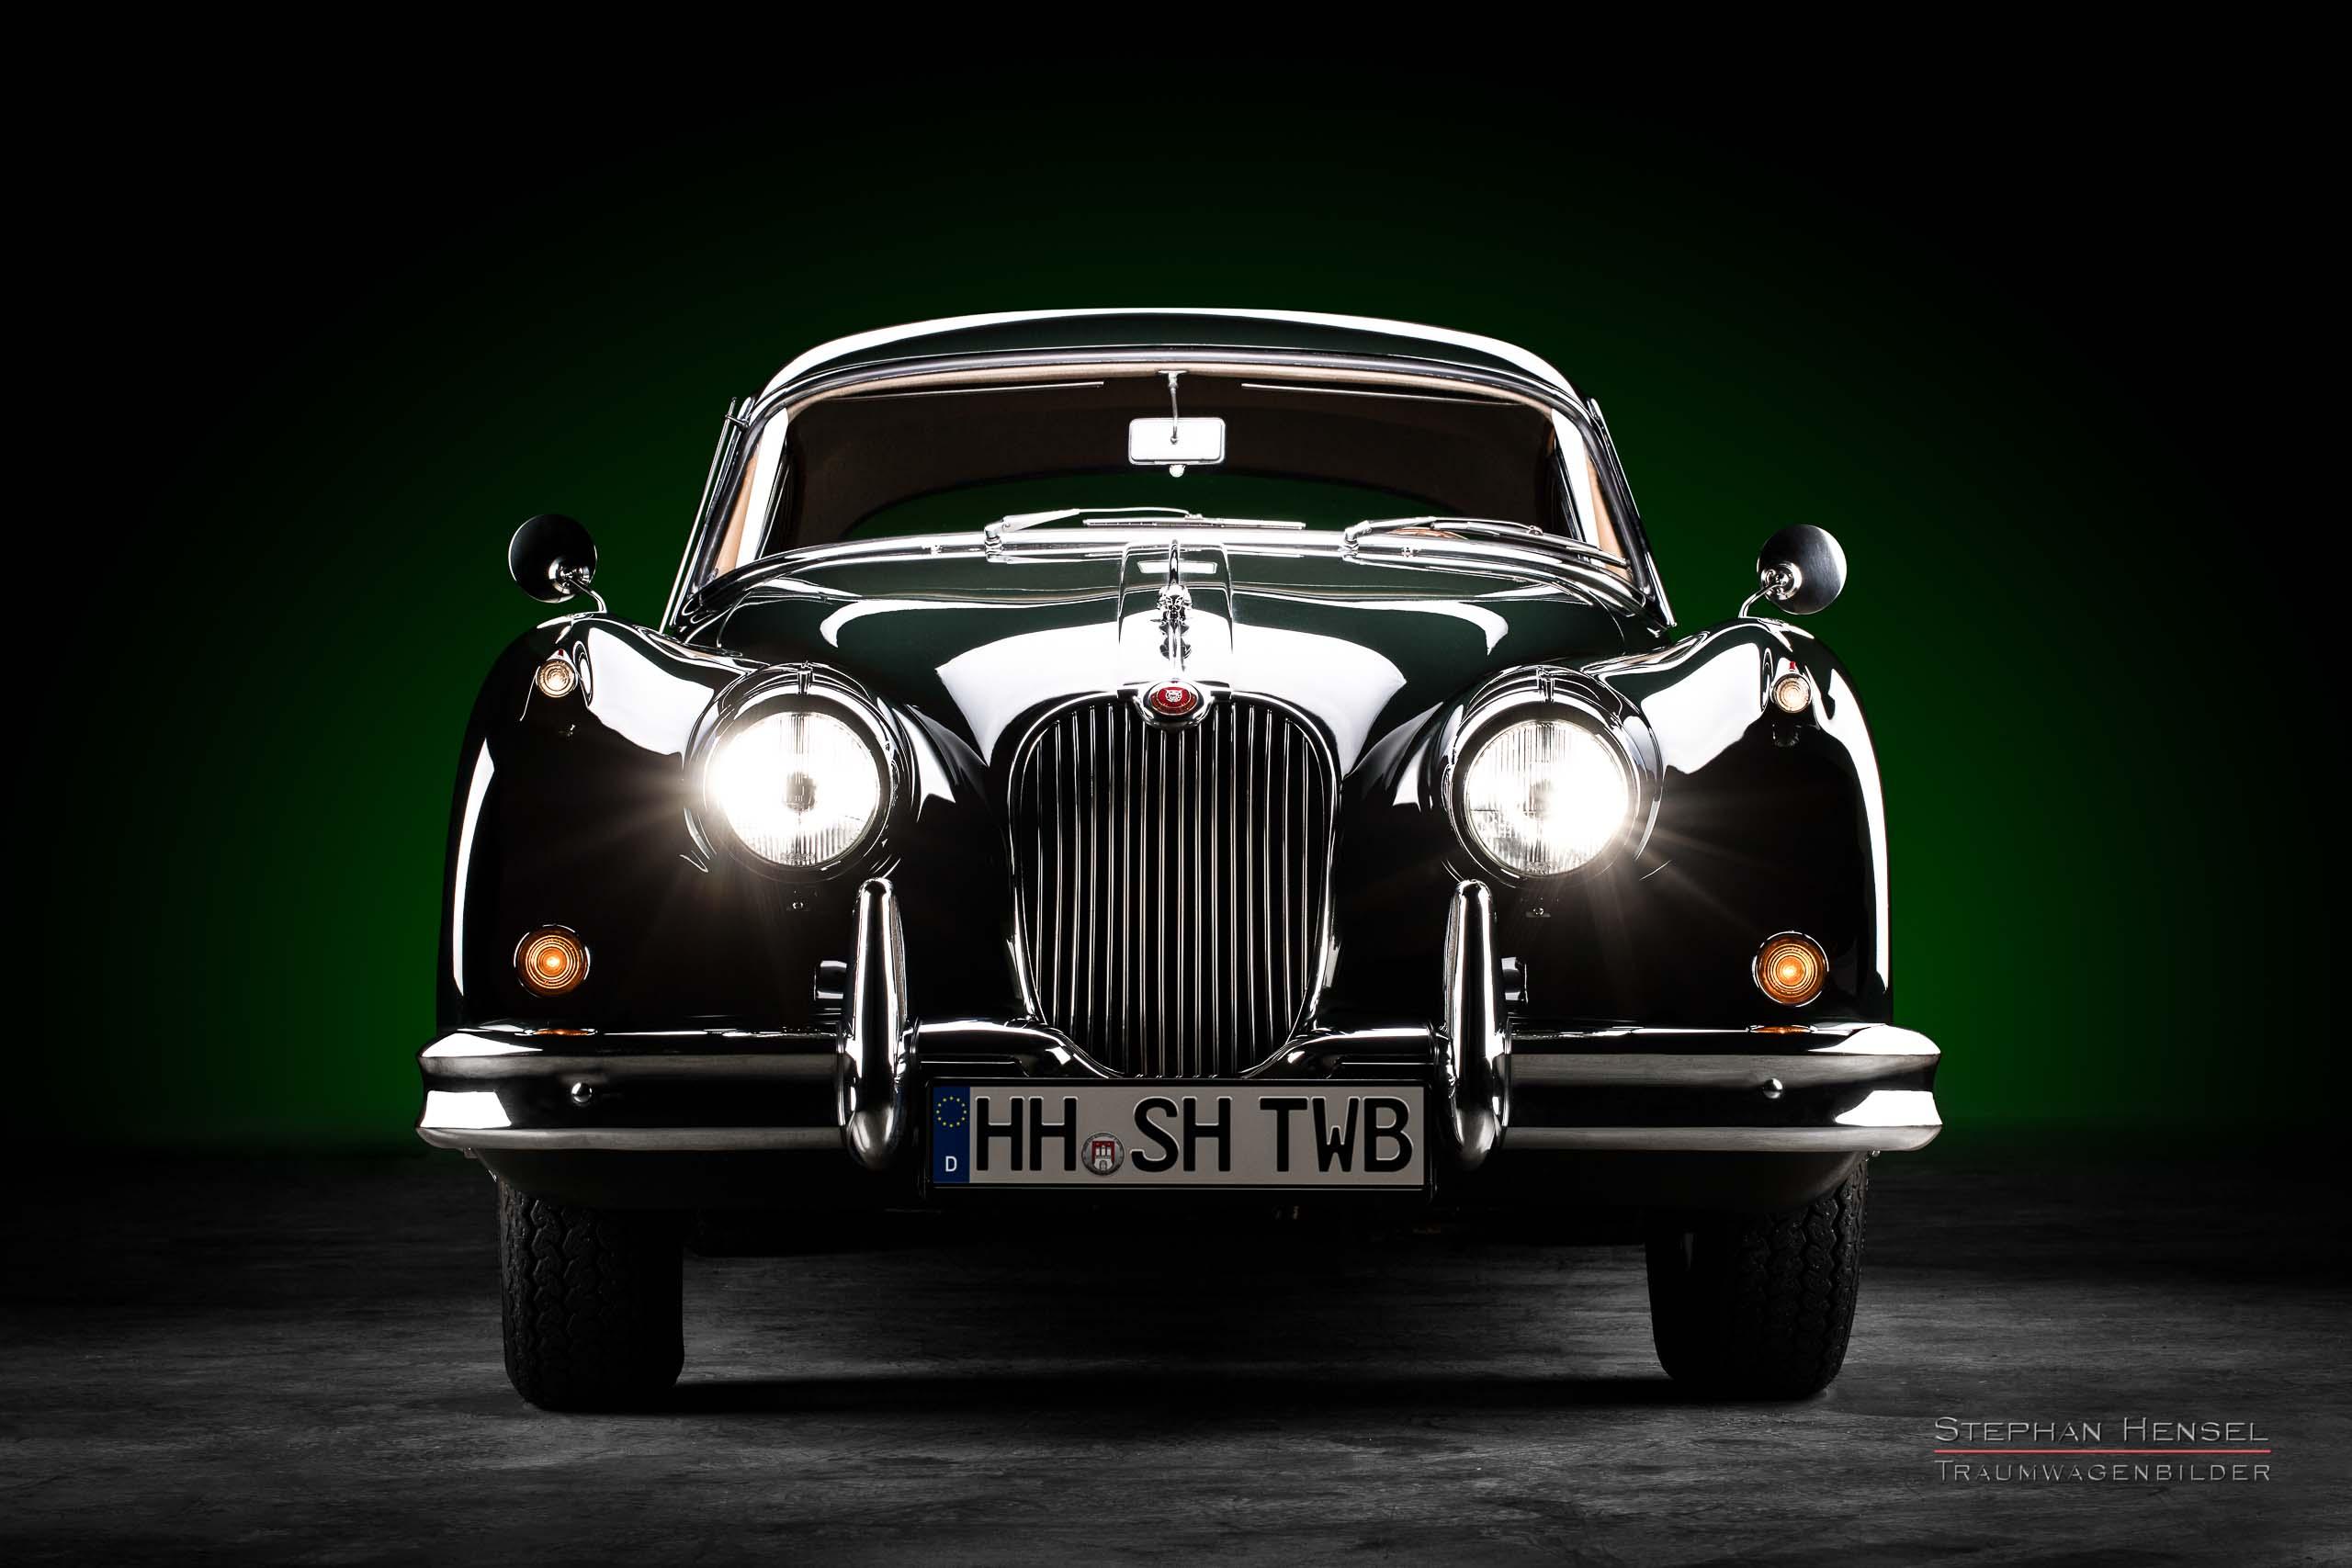 Jaguar XK 150 FHC, 1960, Frontalansicht, Autofotograf, Hamburg, Automobilfotograf, Oldtimerfotograf, Oldtimerfotografie, Car Photography, Stephan Hensel